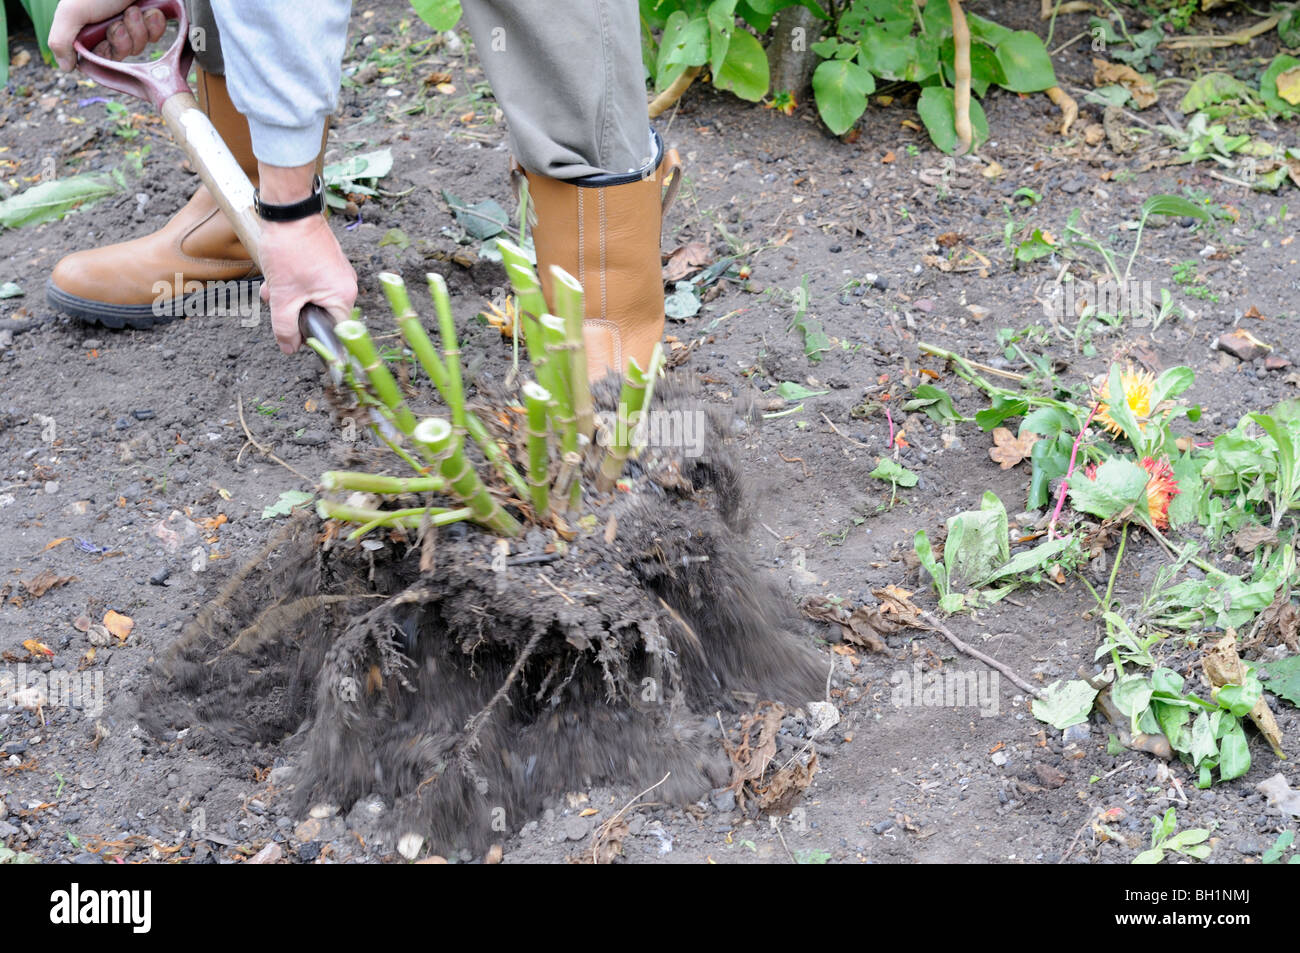 Dahlia tubers, gardener digging up tubers in preparation for winter storage, UK, October - Stock Image